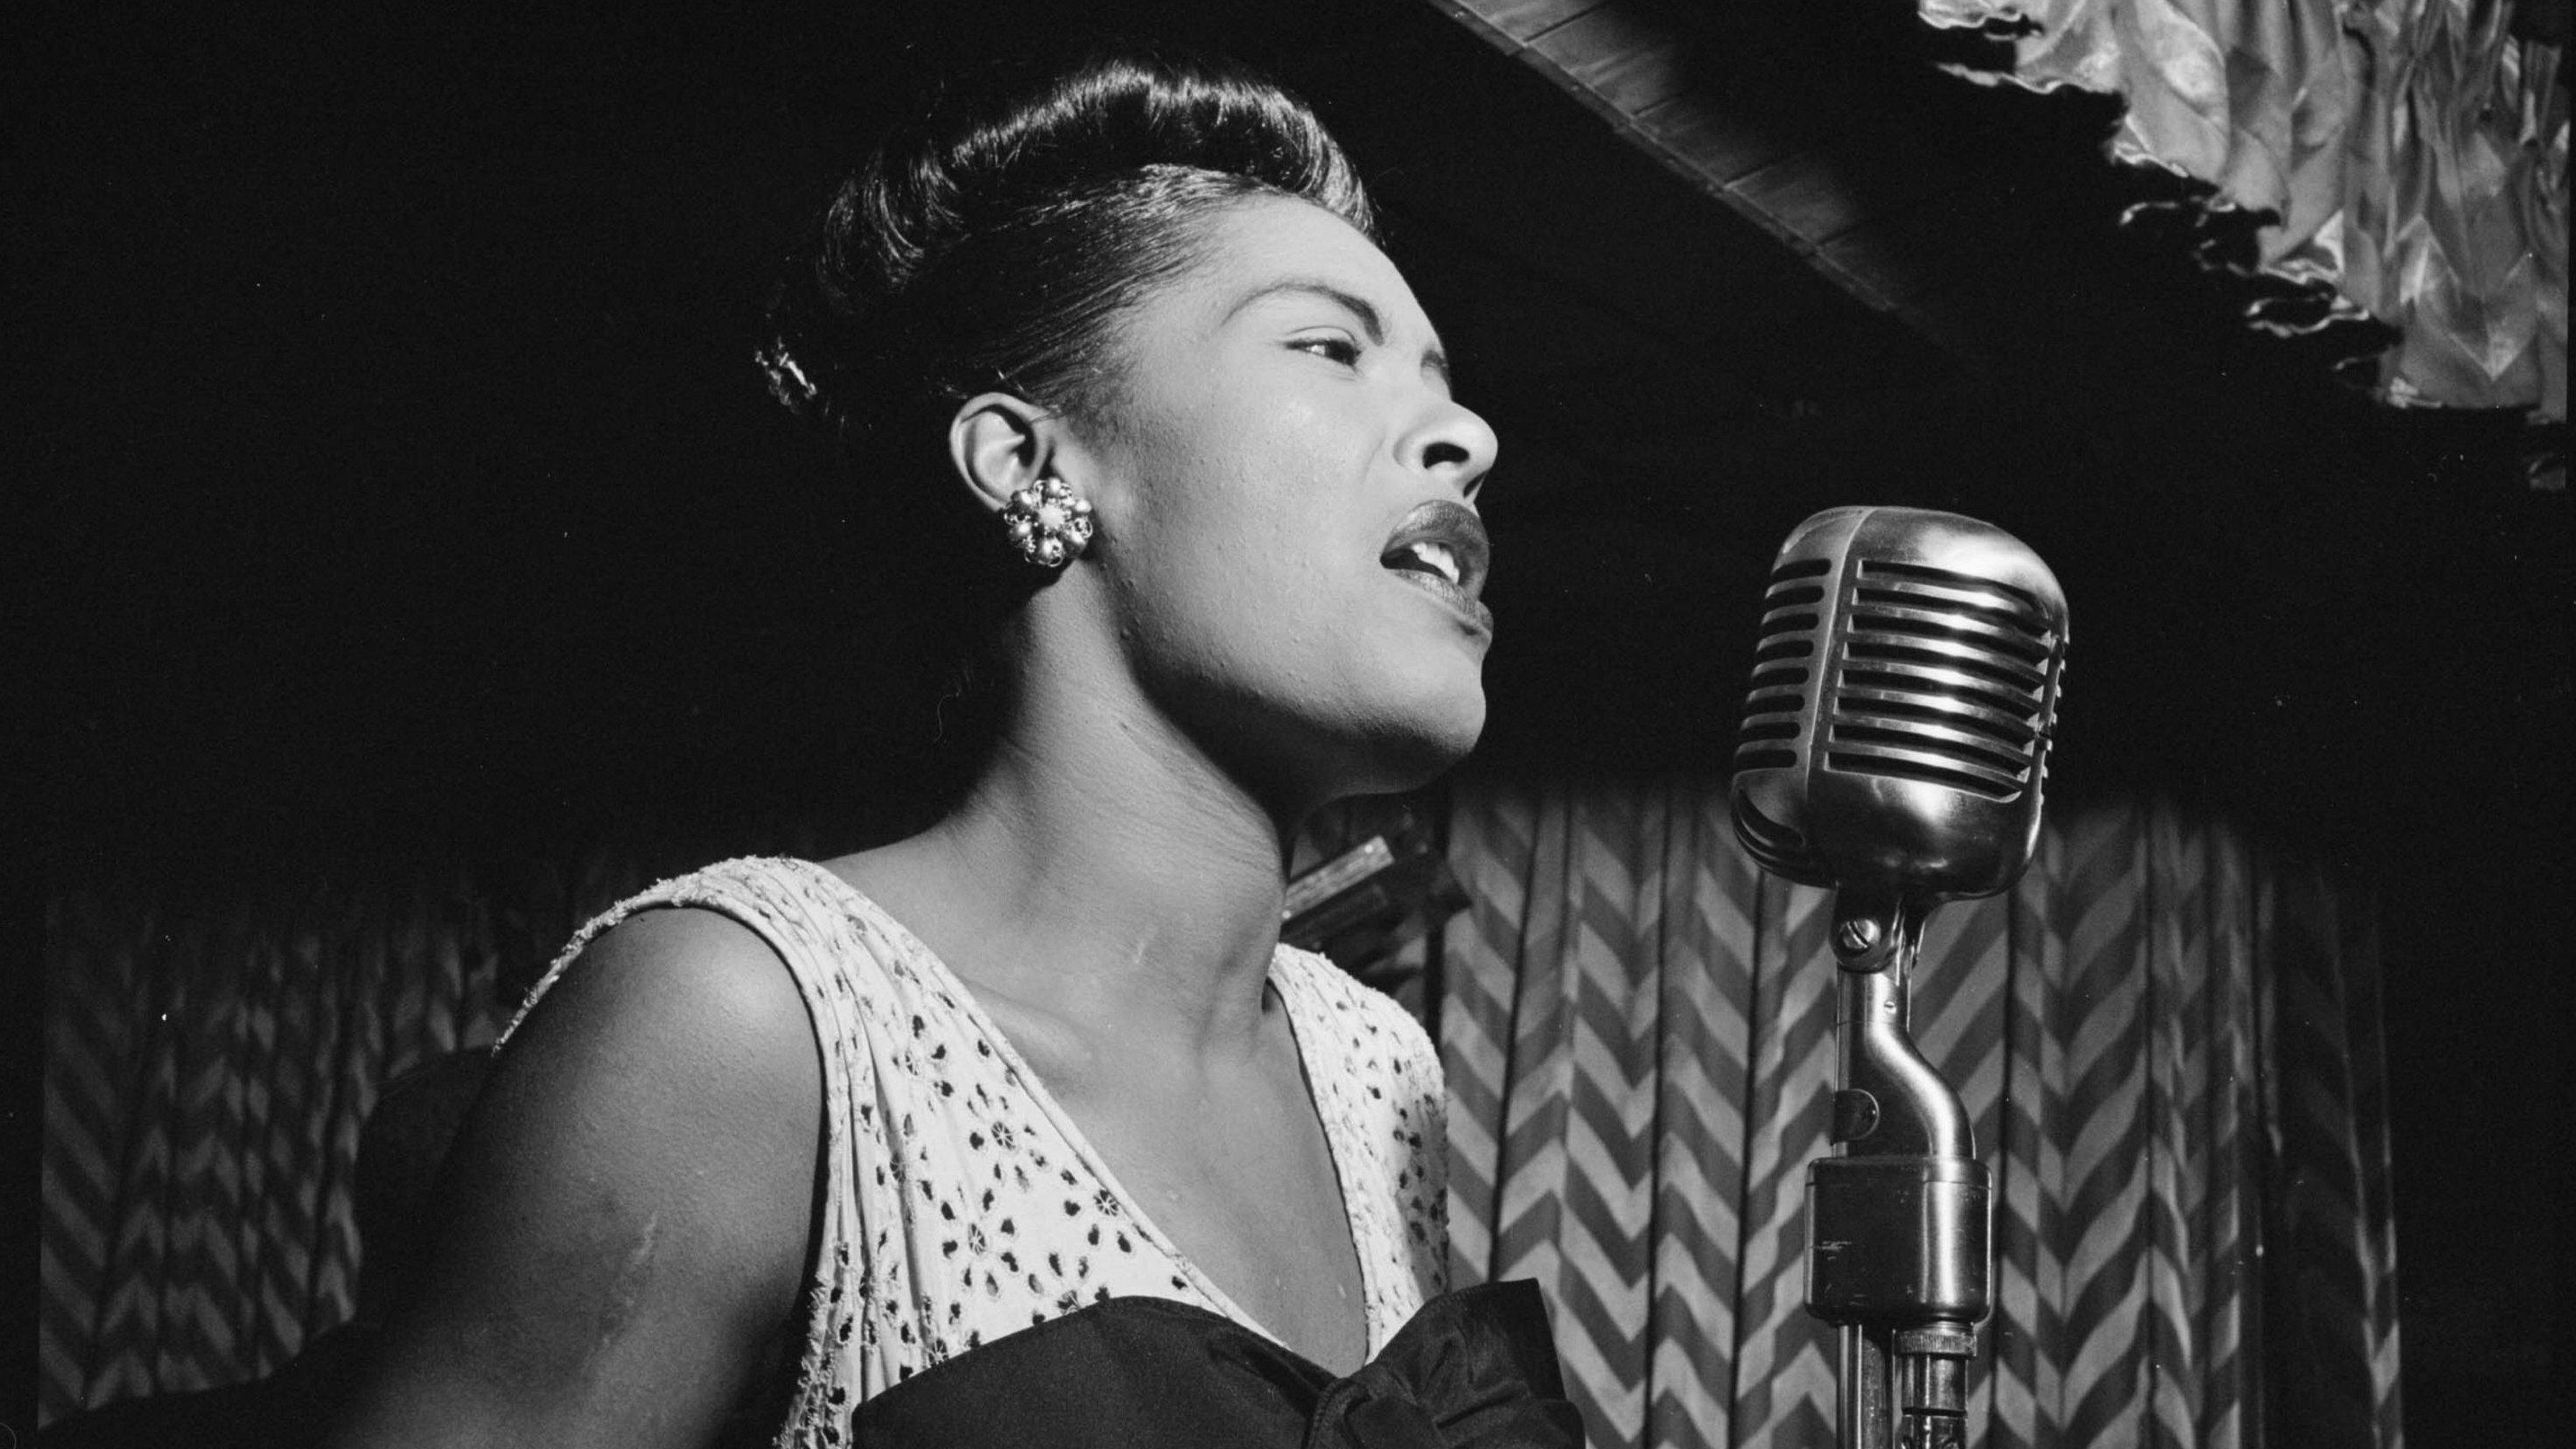 Billie Holiday: A Singer Beyond Our Understanding